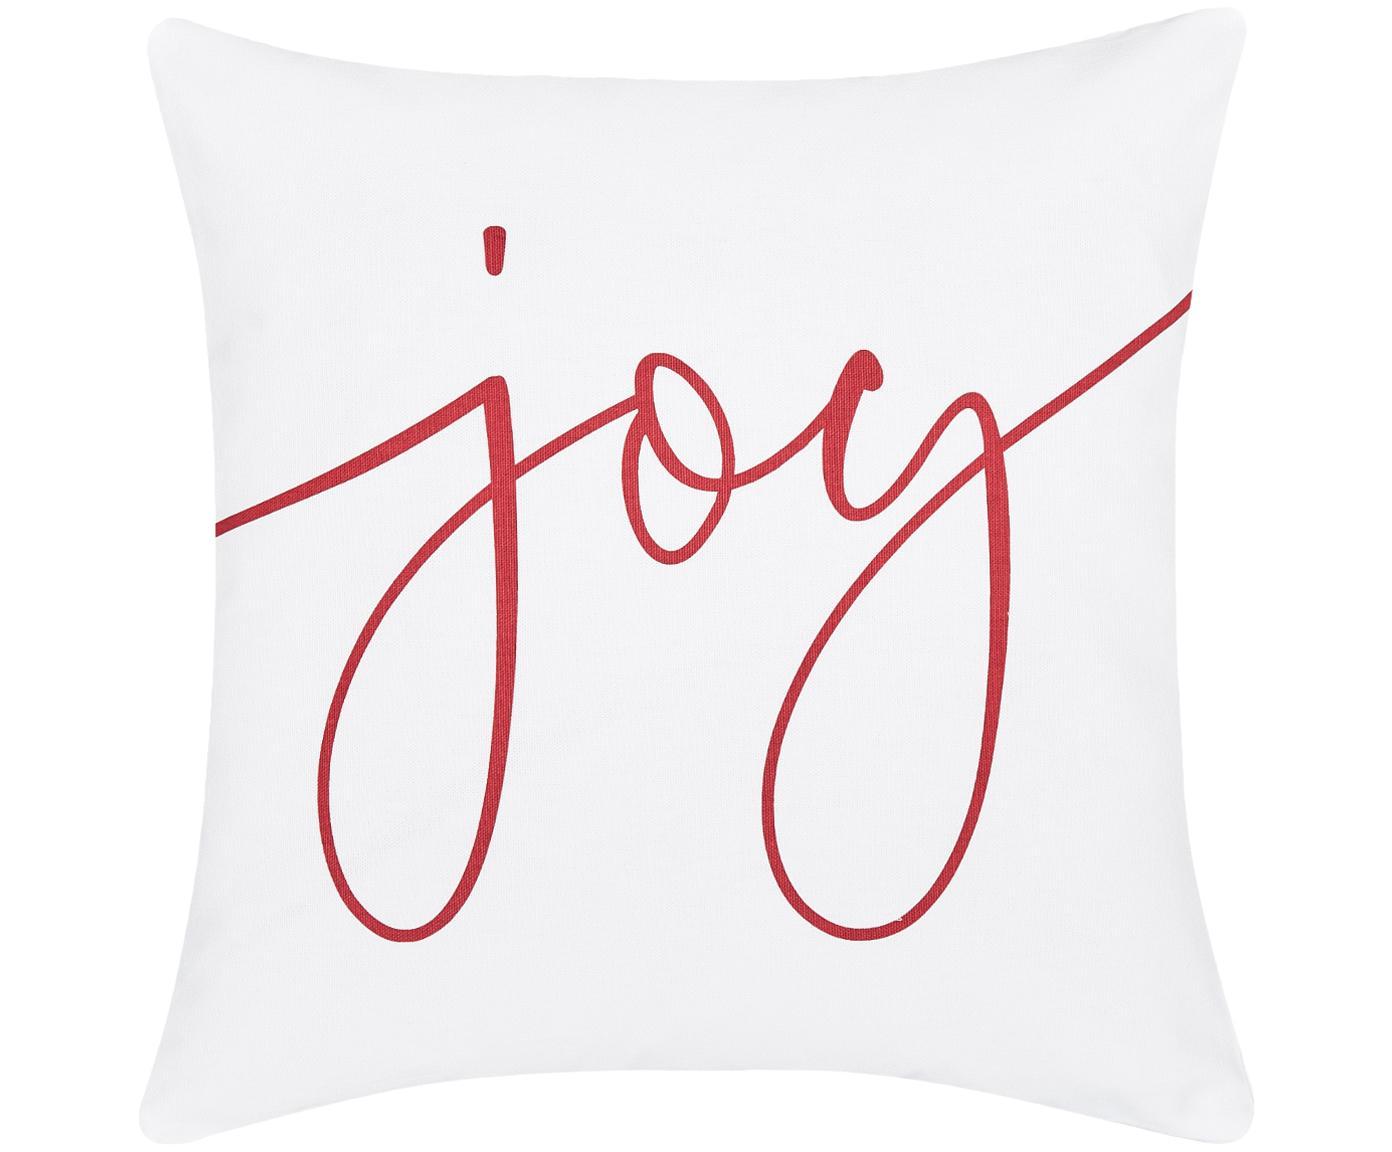 Kissenhülle Joy mit Schriftzug in Weiss-Rot, Baumwolle, Weiss, Rot, 40 x 40 cm